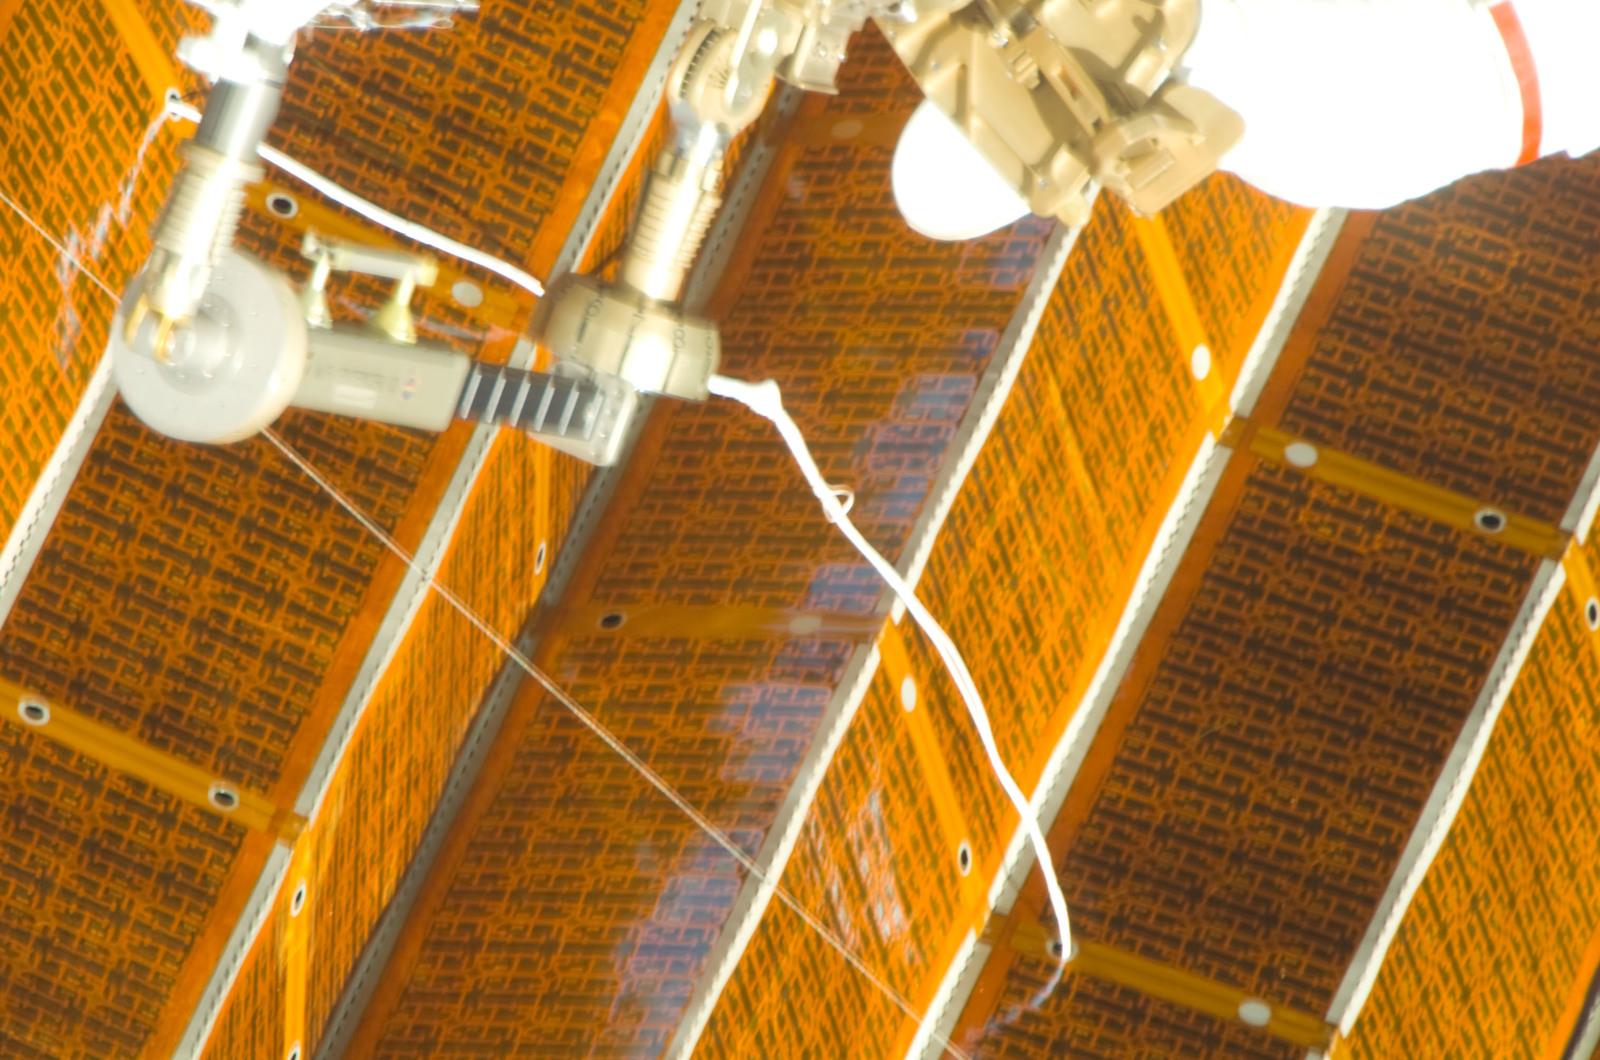 S120E008412 - STS-120 - EVA 4 - P6 4B solar array repair